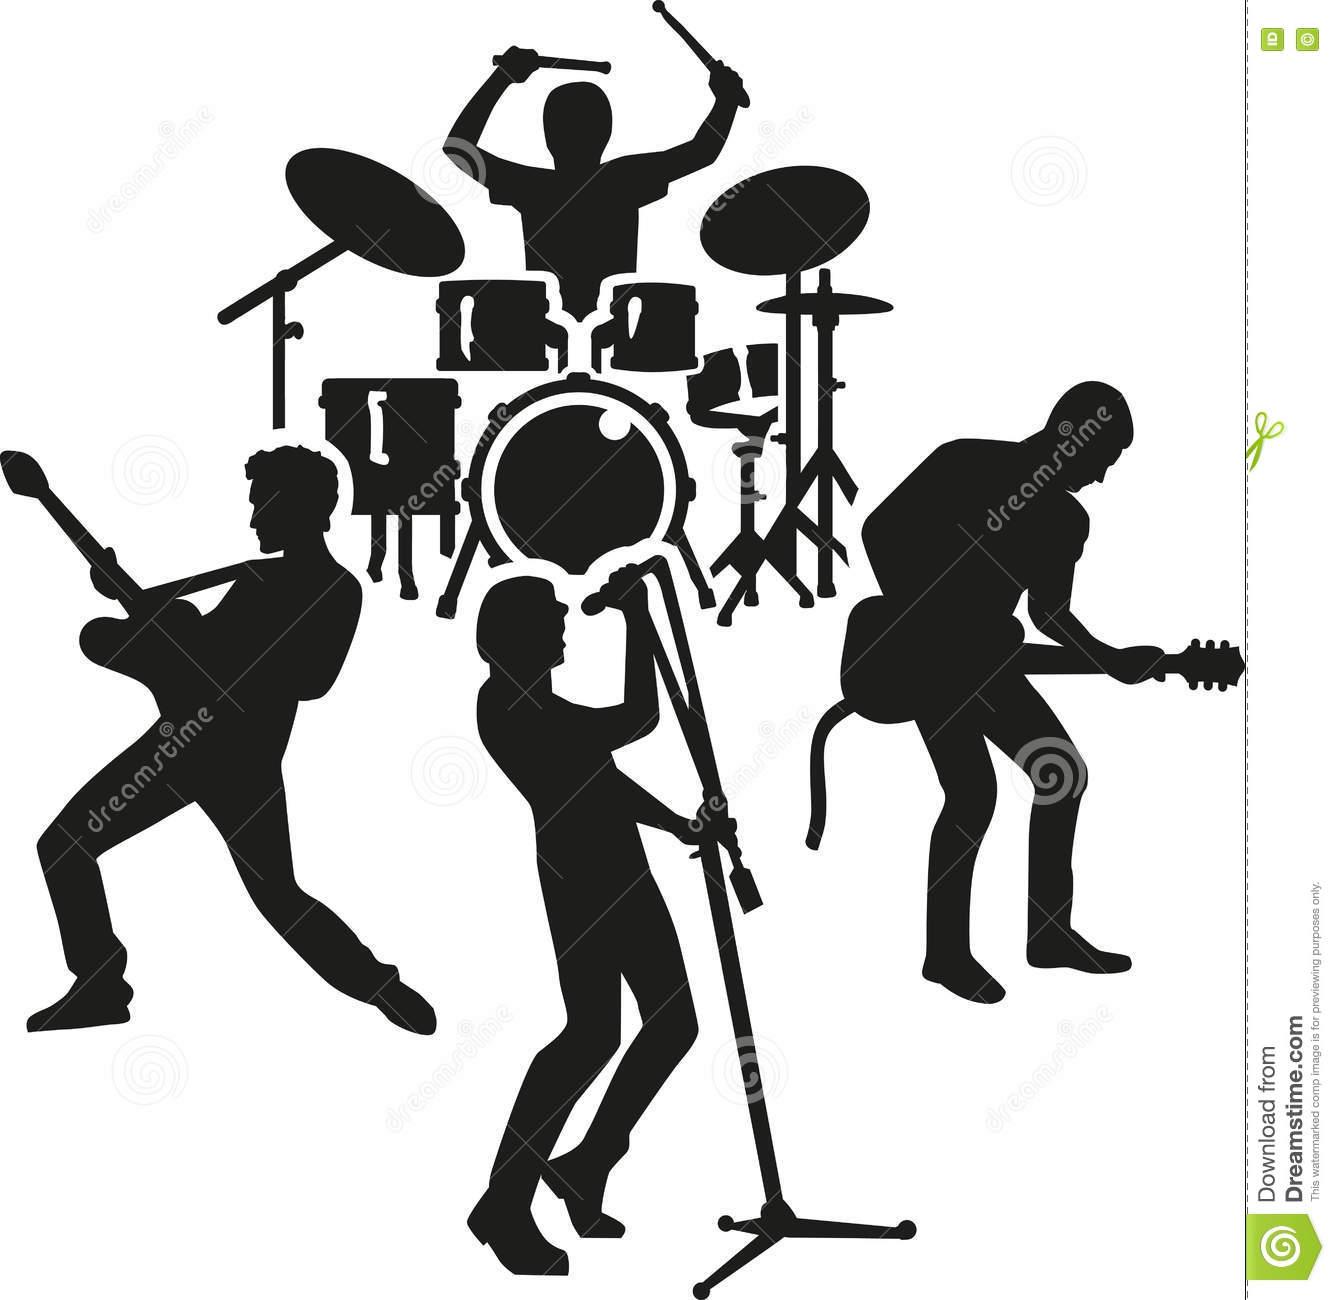 Banda de rock clipart clip transparent download Rock Band Silhouette Stock Vector Image: 73874654 - Free Clipart clip transparent download